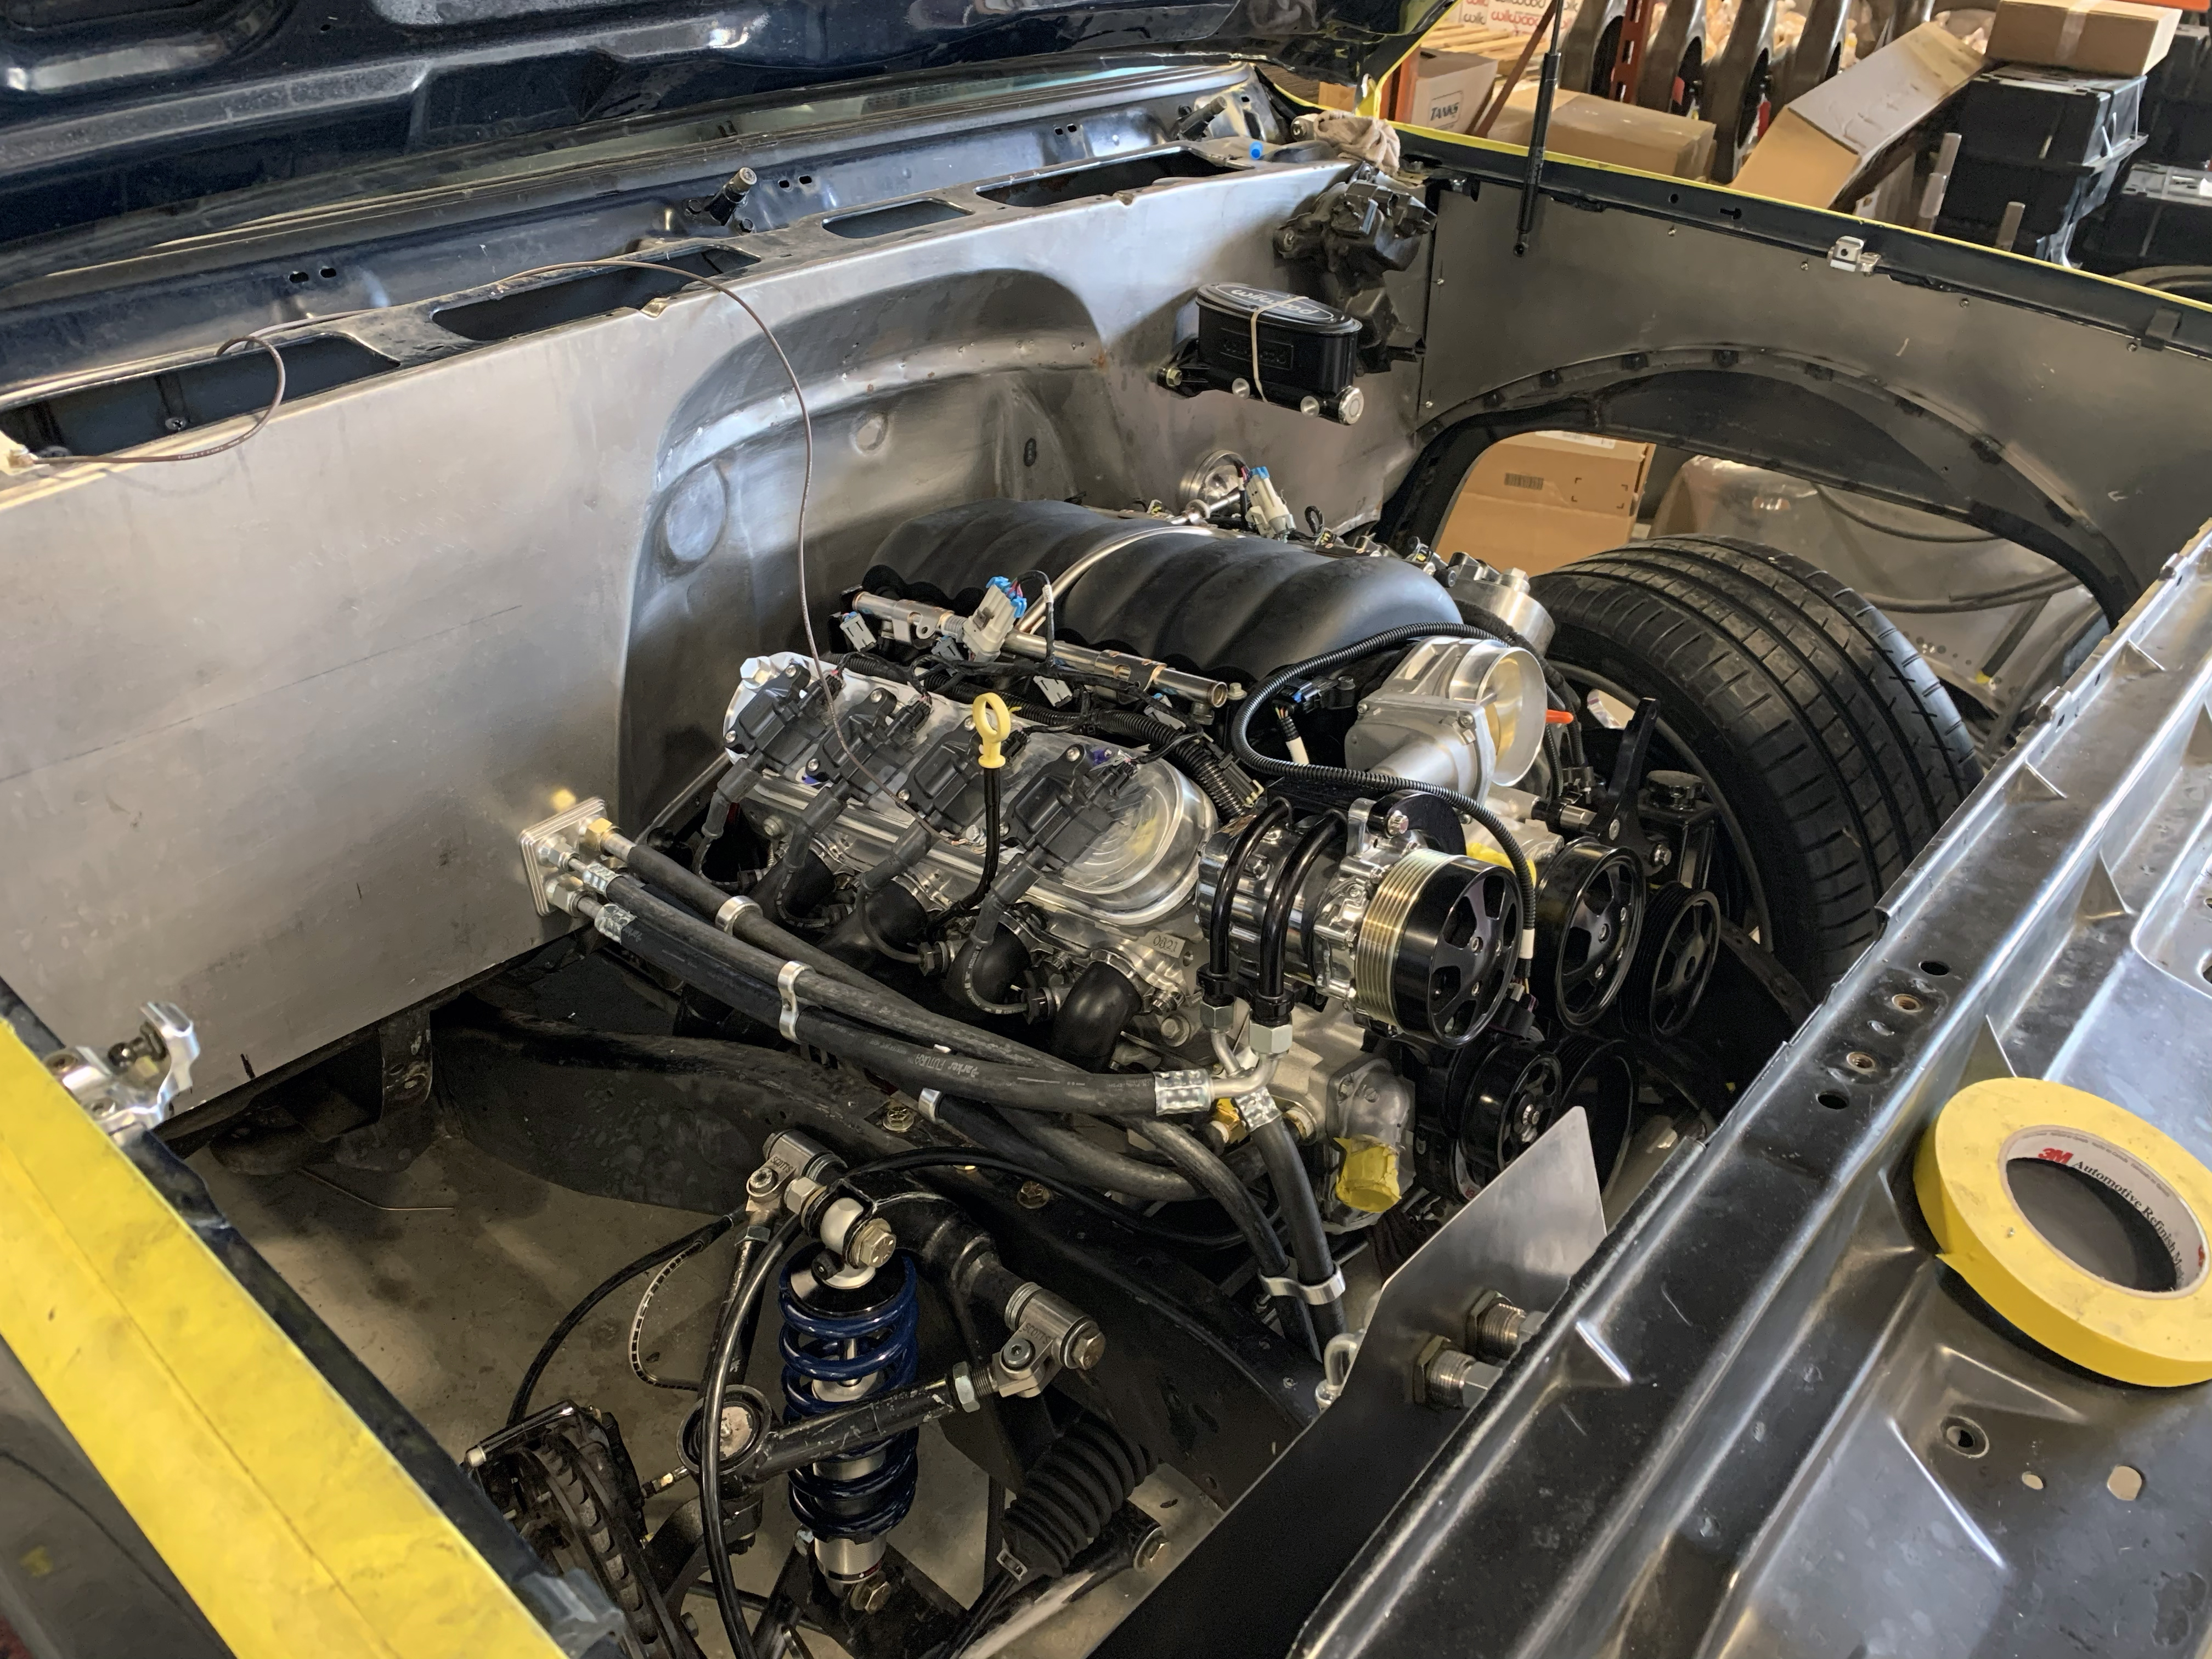 Scotts-Hotrods-82-C10-Blazer-2WD-15